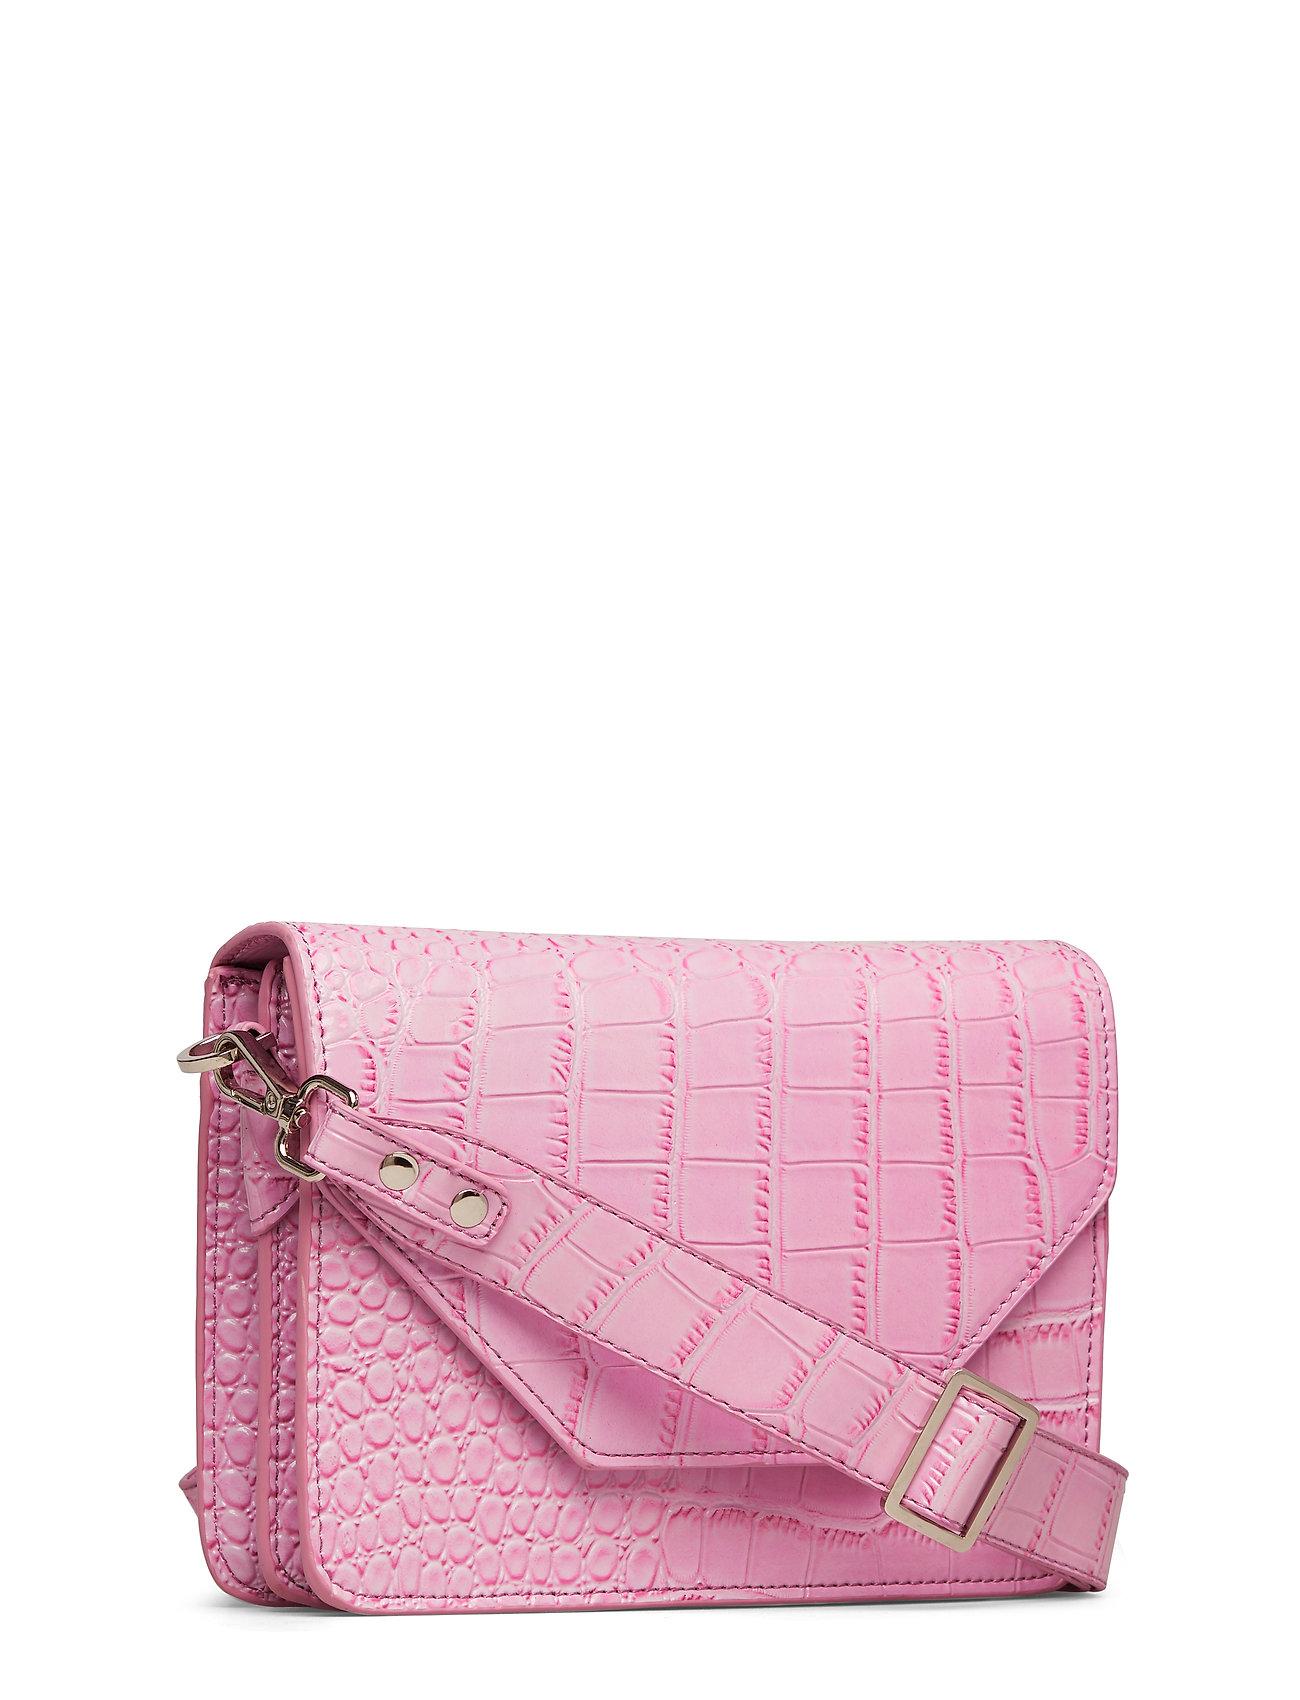 Bag Unlimit RosemarypurpleAdax Shoulder Unlimit RosemarypurpleAdax Bag Shoulder qLMGUpjVSz